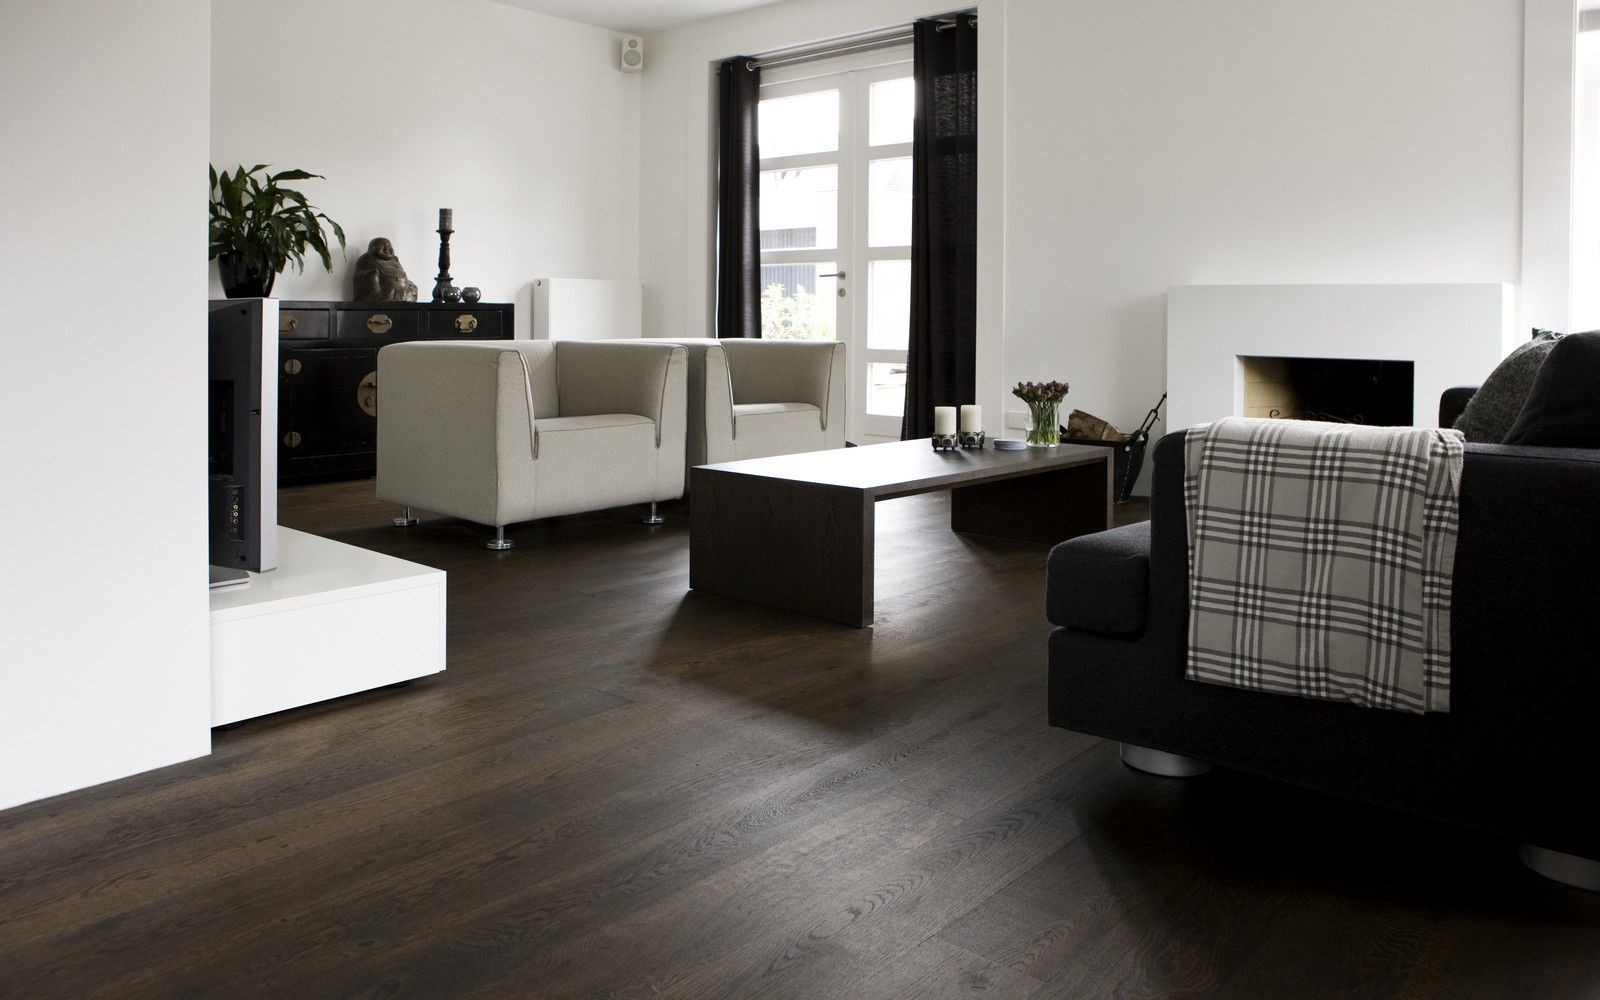 Eiken houten vloer zonder velling De eiken houten vloer